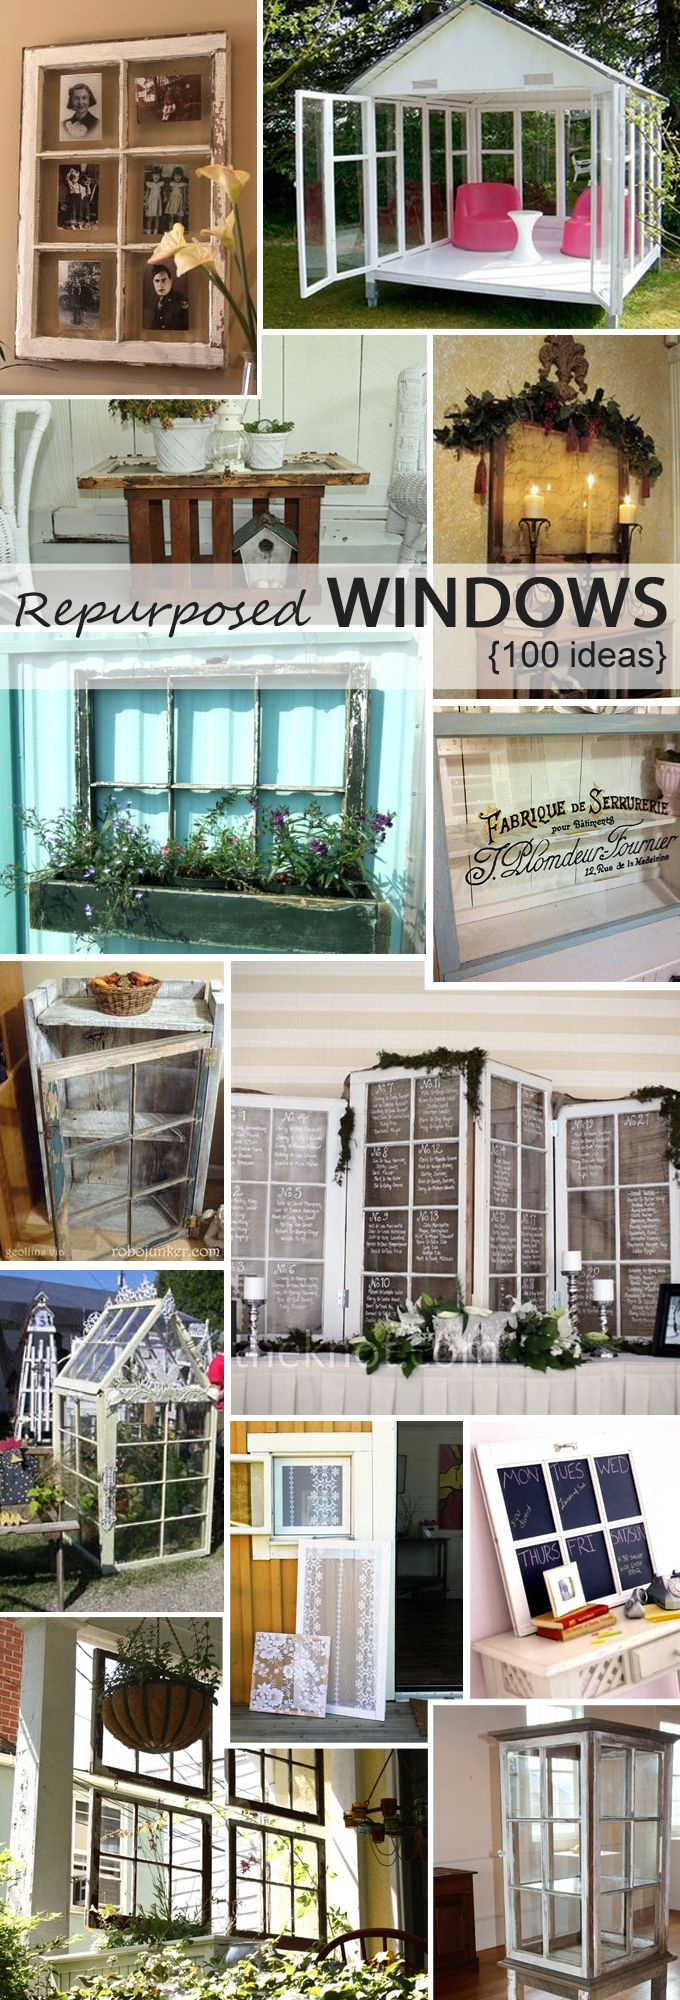 Recycled and Repurposed Window DIY  |  http://recreatedesigncompany.com/repurposed-windows/